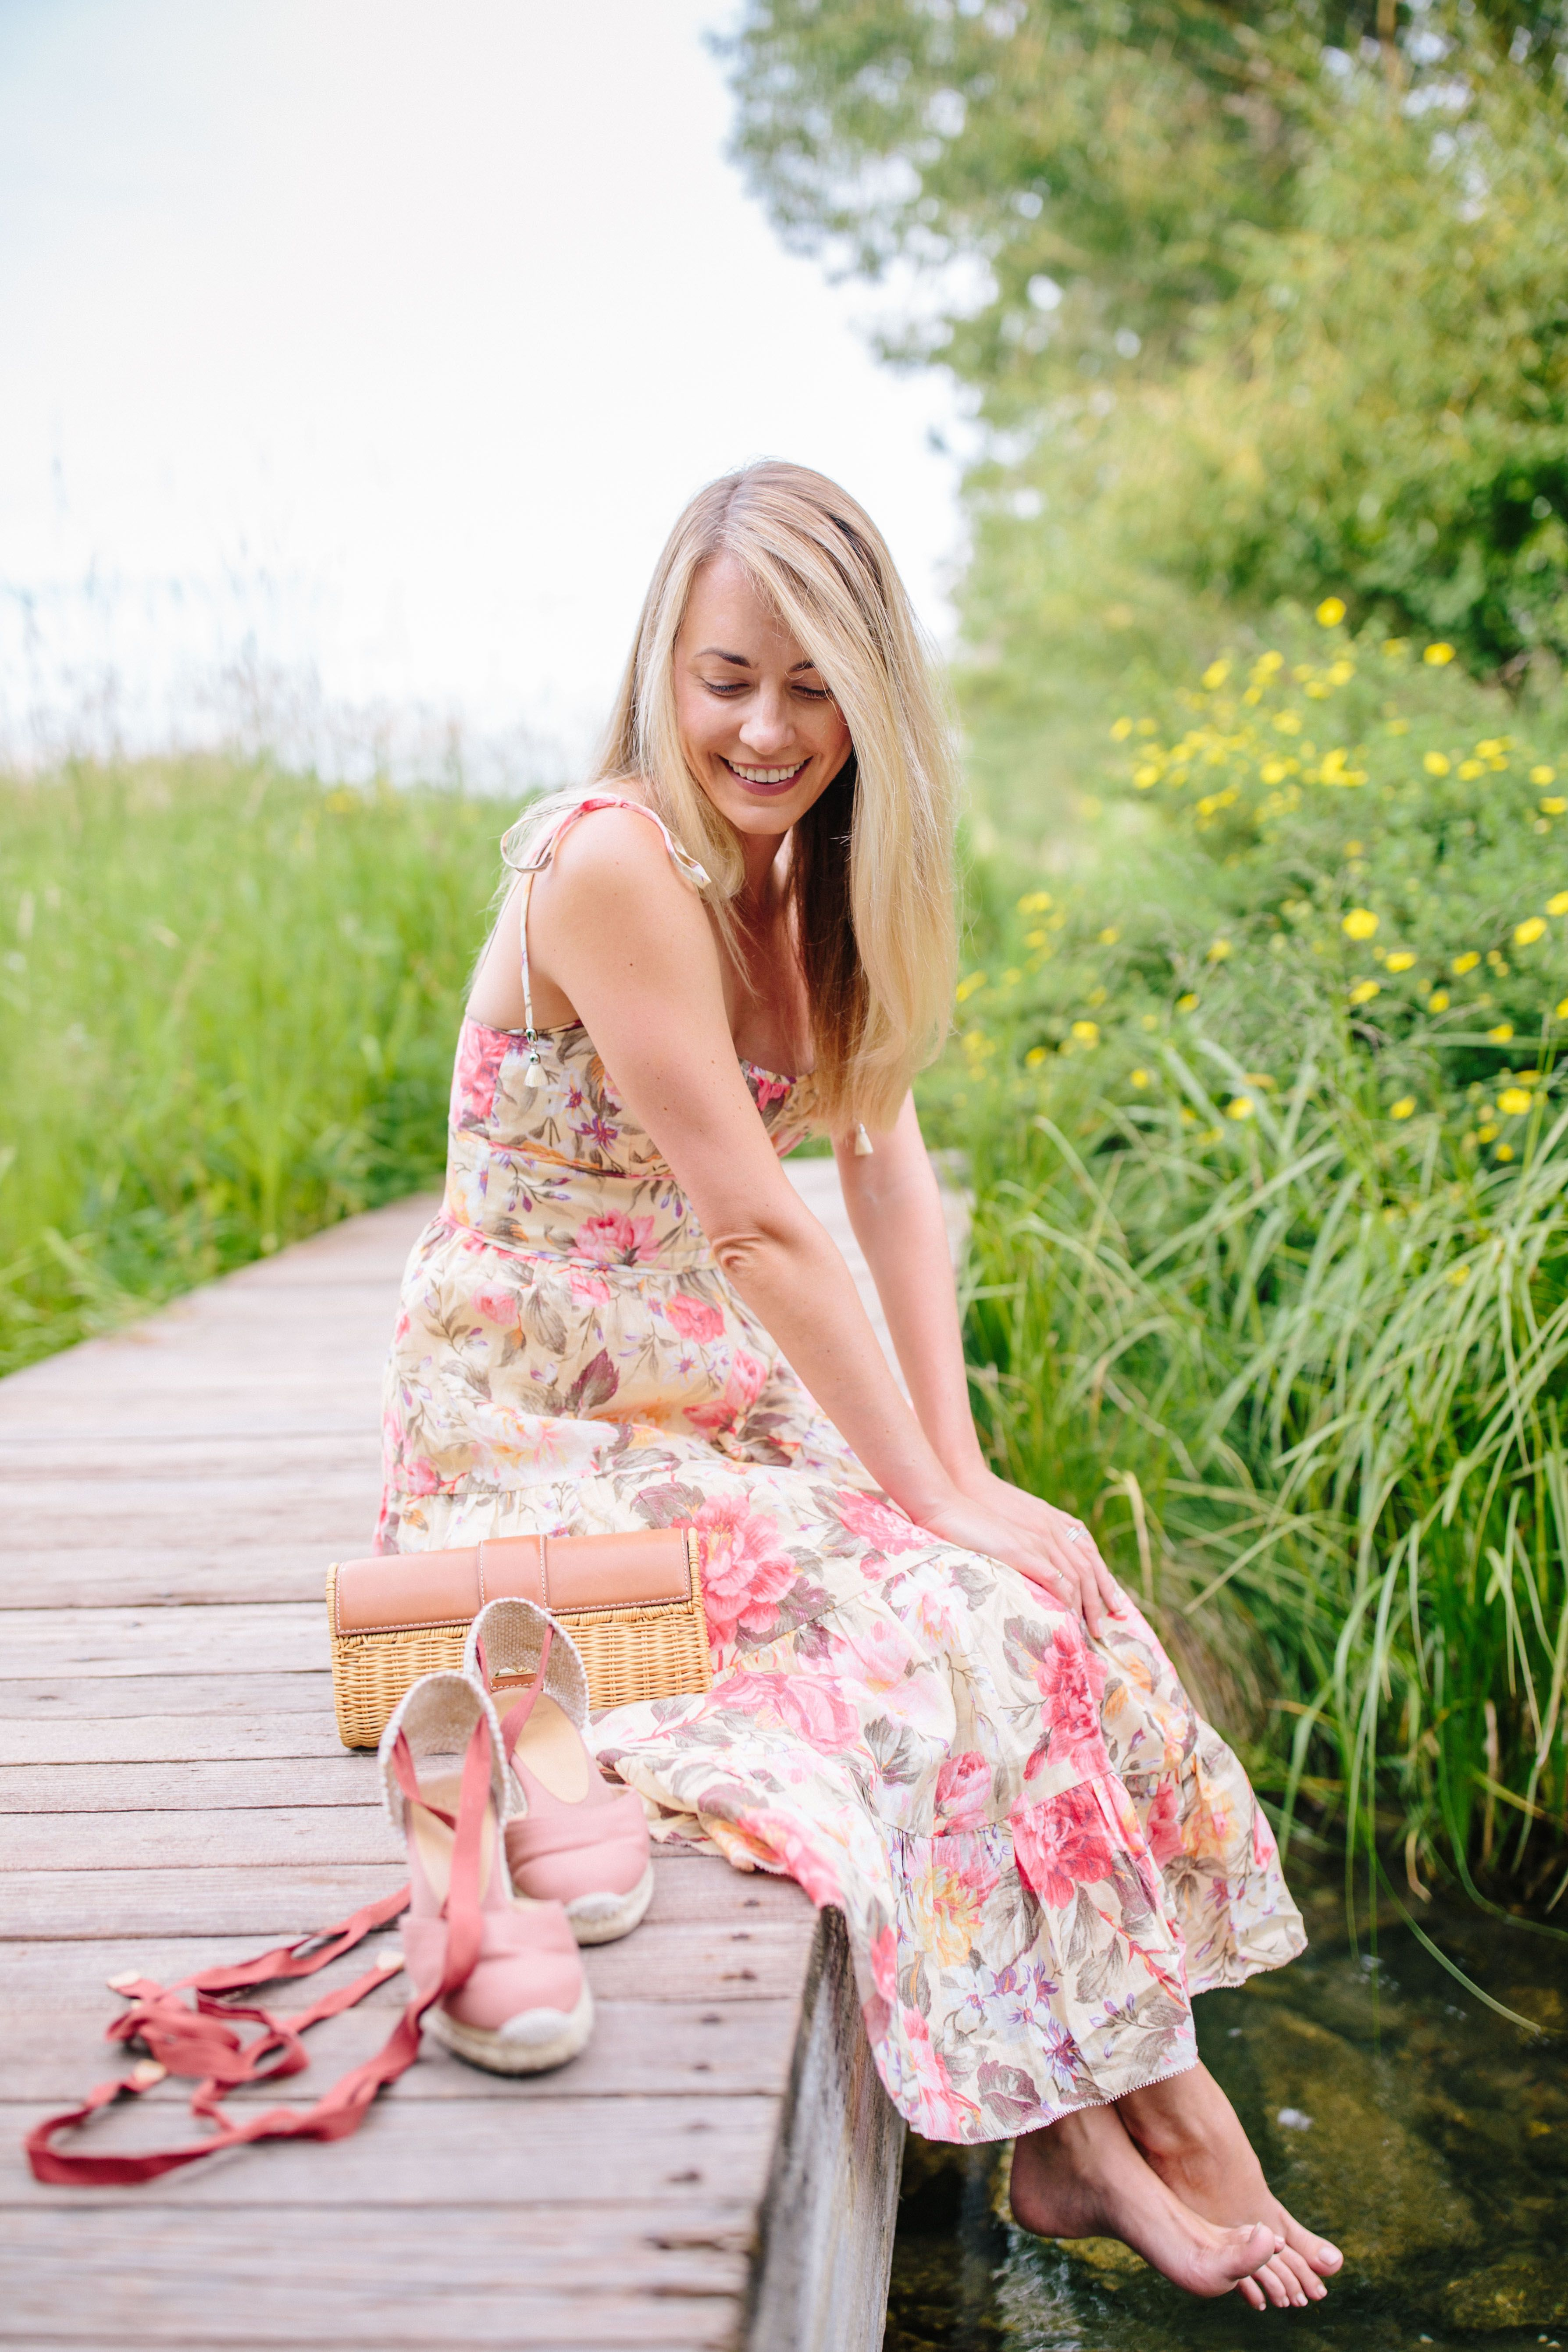 Fall Wedding Guest Dress Guide Rhyme & Reason in 2020